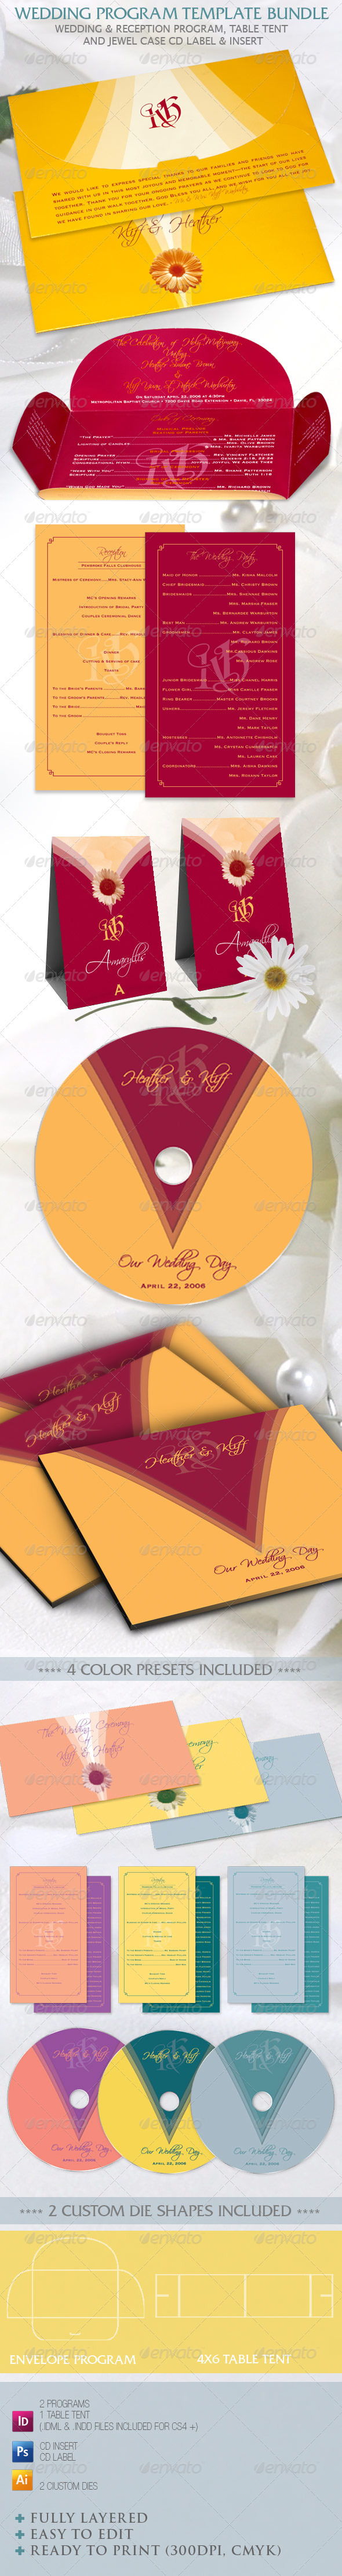 GraphicRiver Wedding Program Template Bundle 758935